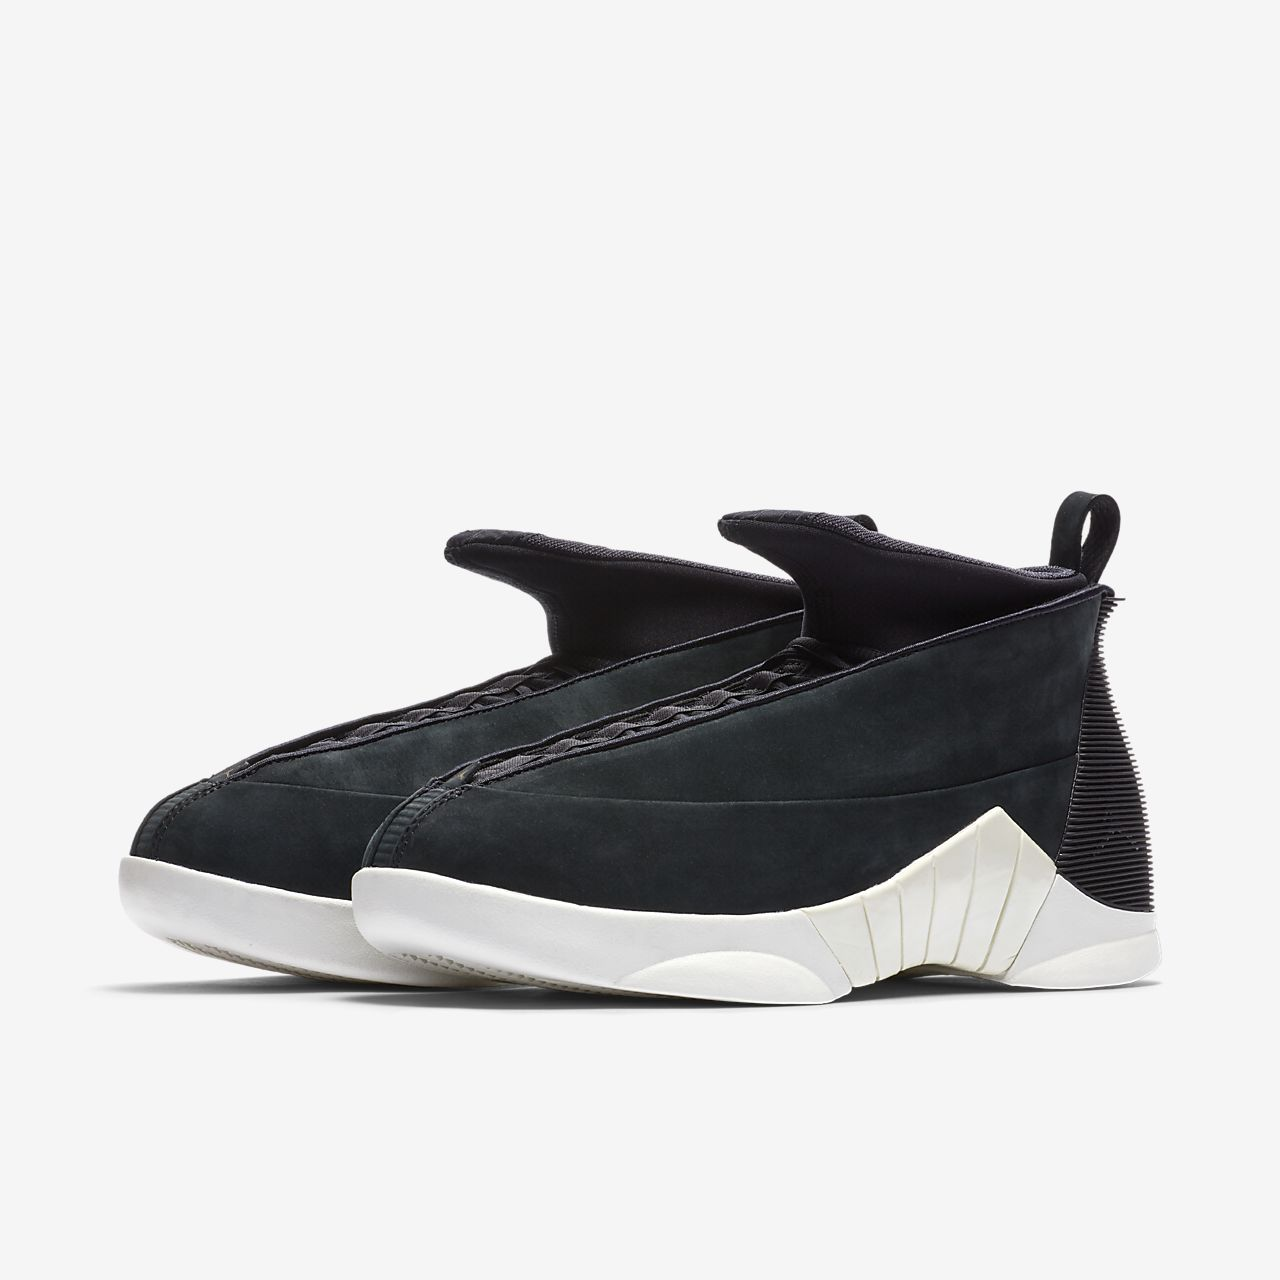 new arrival 36a79 5ff5e ... Chaussure Air Jordan 15 Retro x PSNY pour Homme